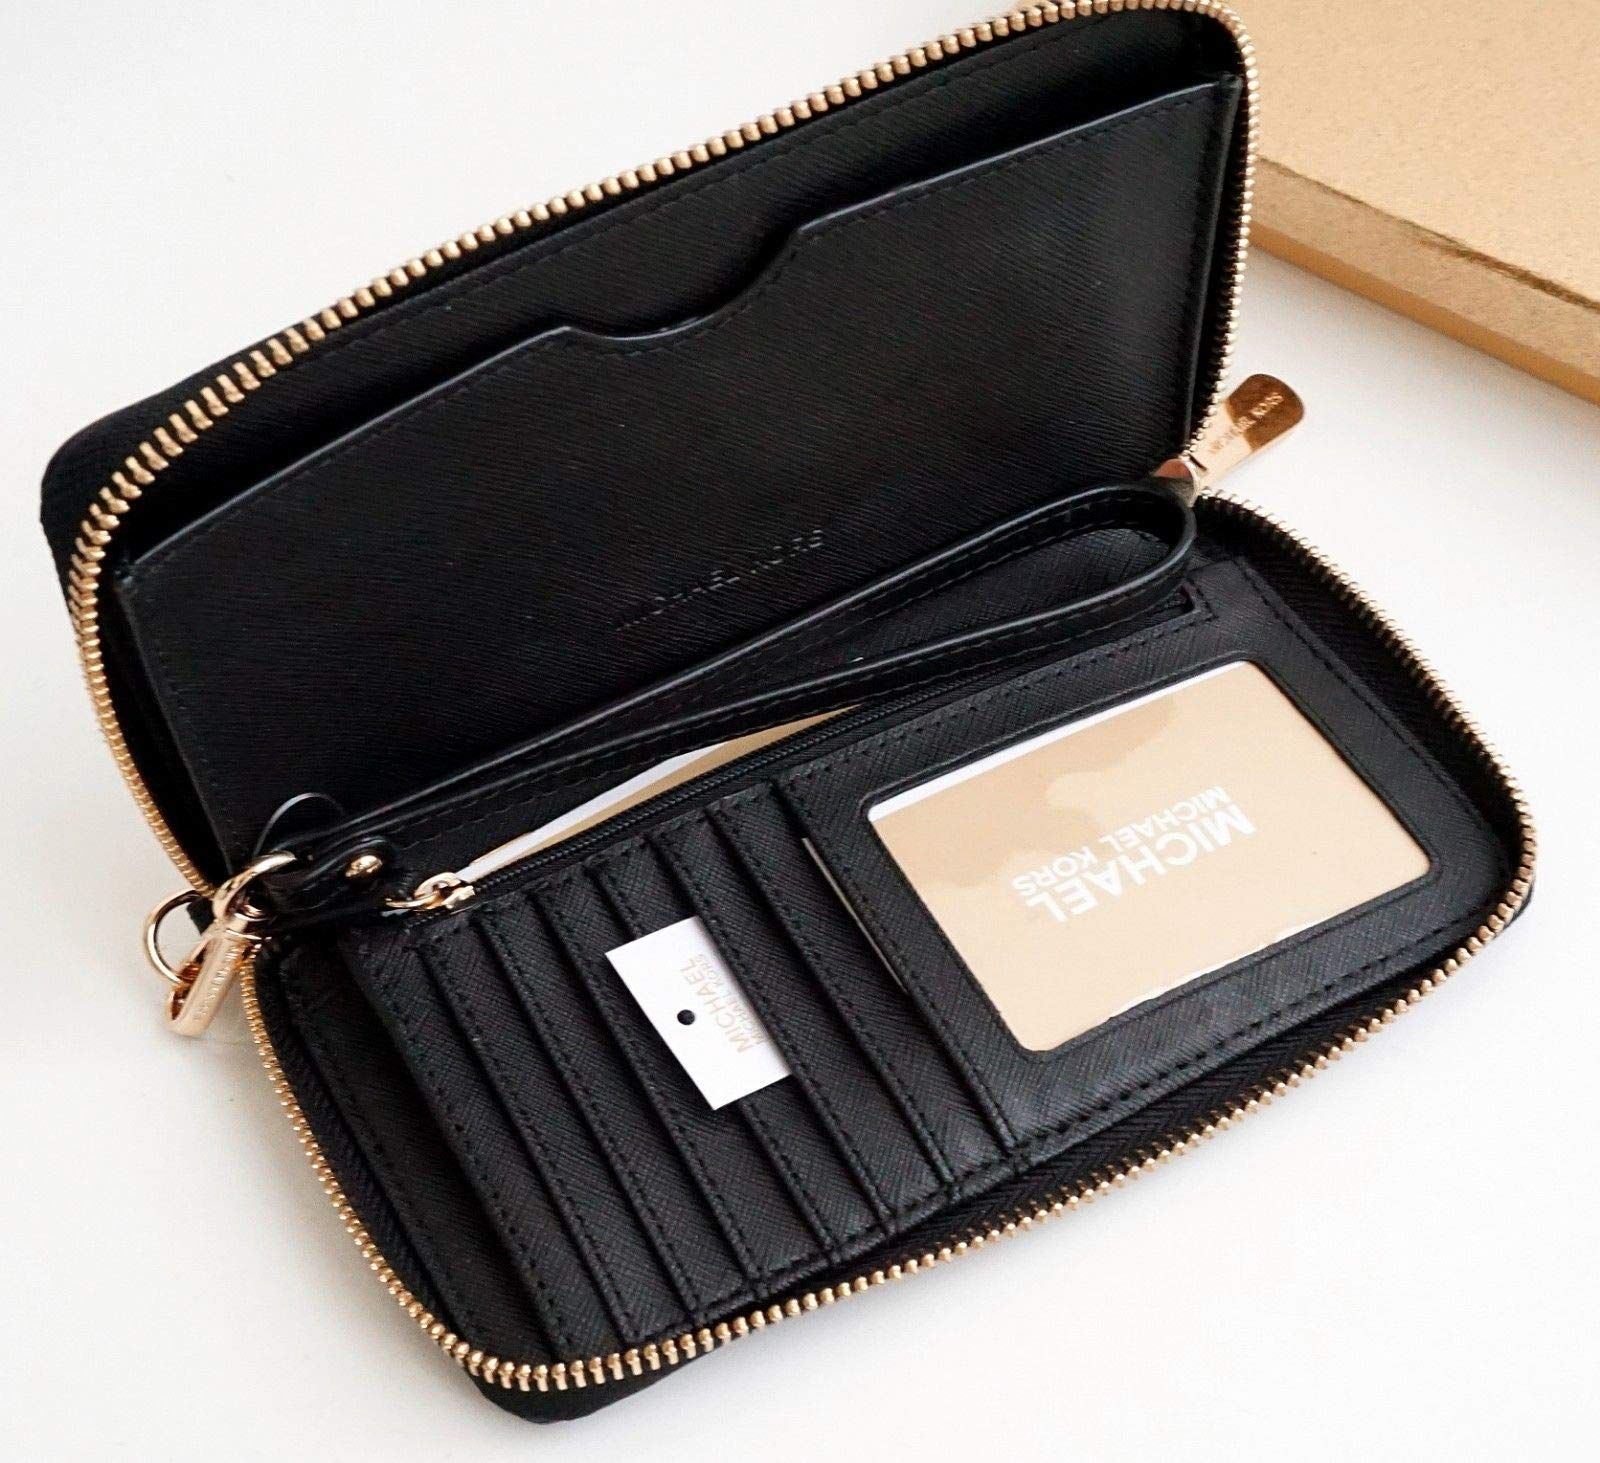 Michael Kors Giftables LG Flat MF Phone Case Black Saffiano Heart Studs by Michael Kors (Image #4)